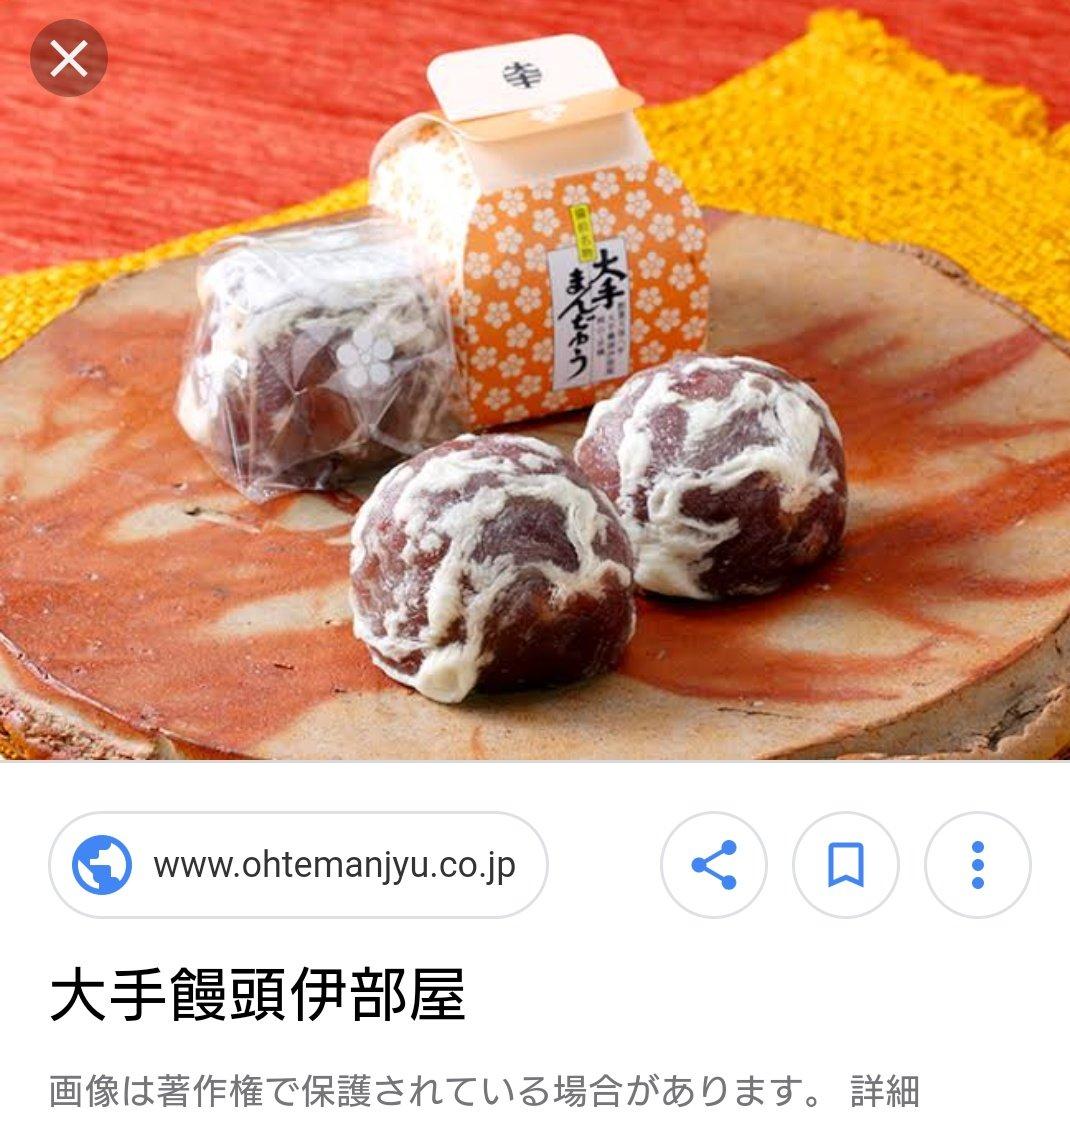 test ツイッターメディア - @jfn_seasoning  いつも楽しく拝聴しています! 岡山のお土産には 日本三大饅頭の「大手饅頭」ですね! https://t.co/toxoPoghBX